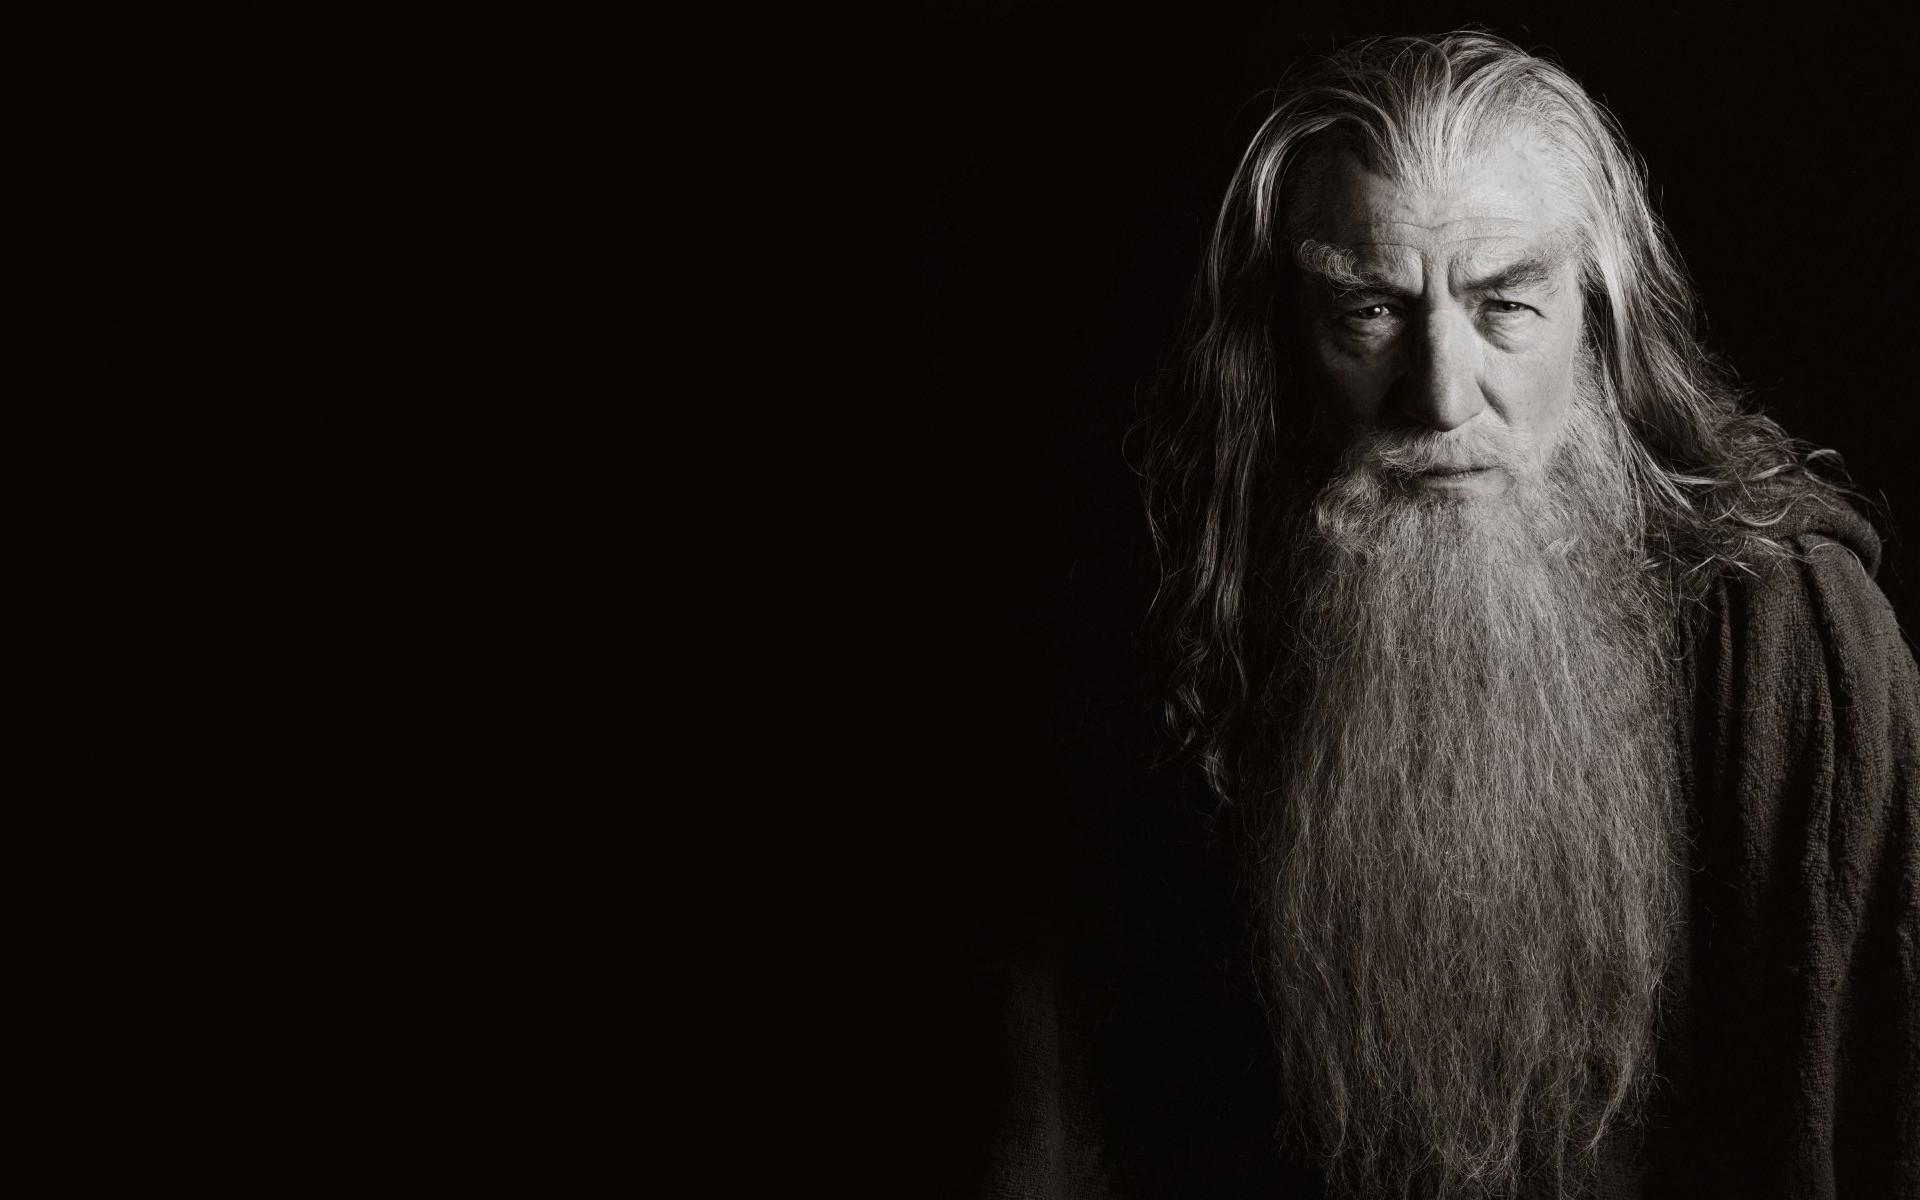 Gandalf, Sir Ian McKellen